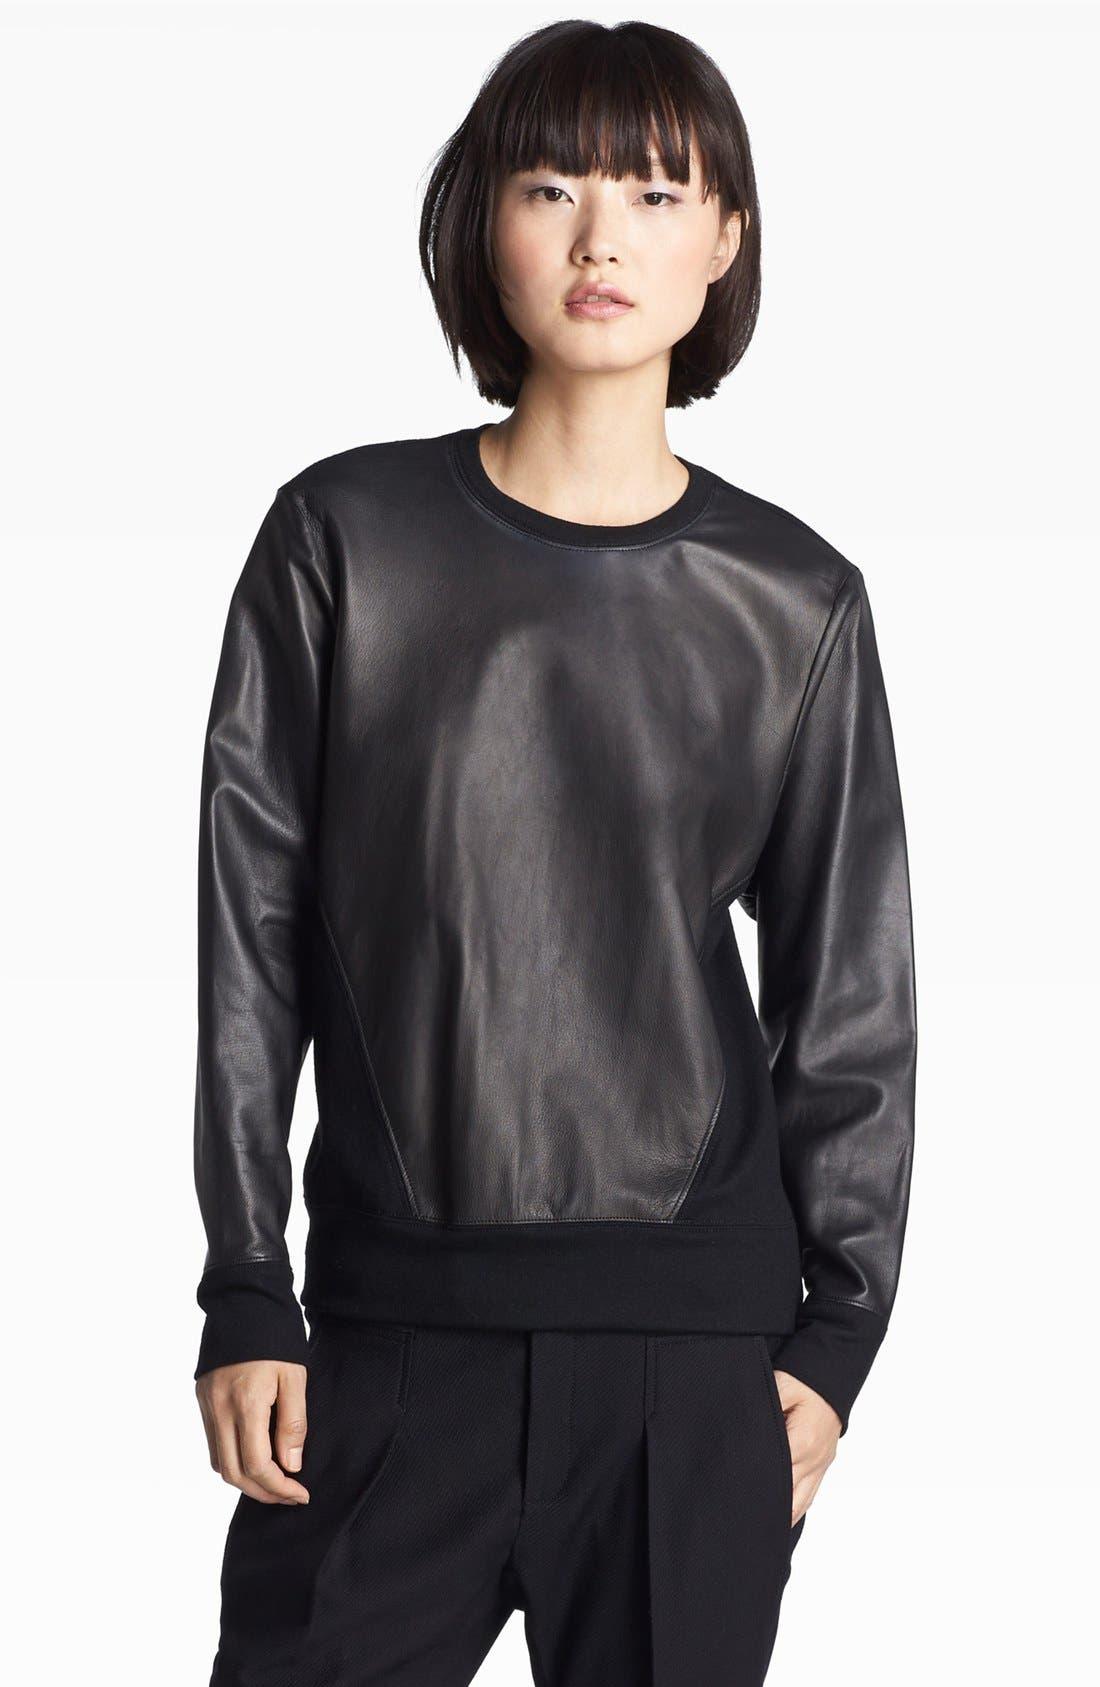 Alternate Image 1 Selected - Helmut Lang Leather Sweatshirt